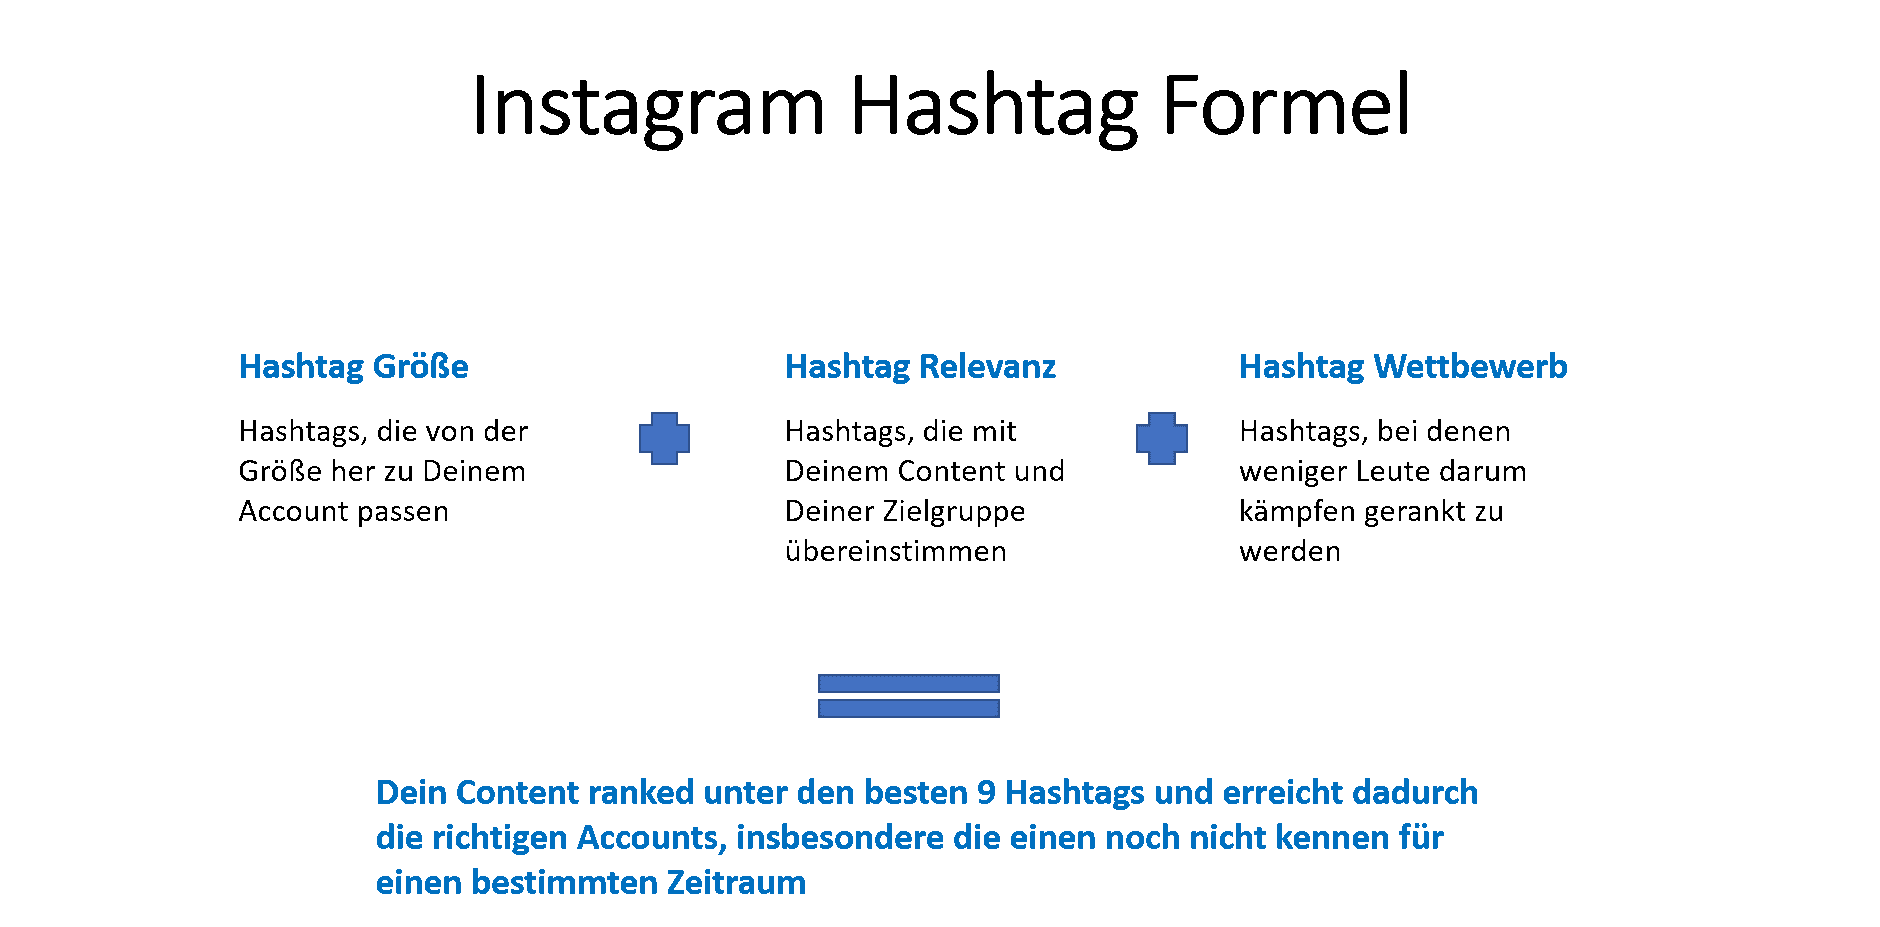 Instagram Hashtag Fomrmel